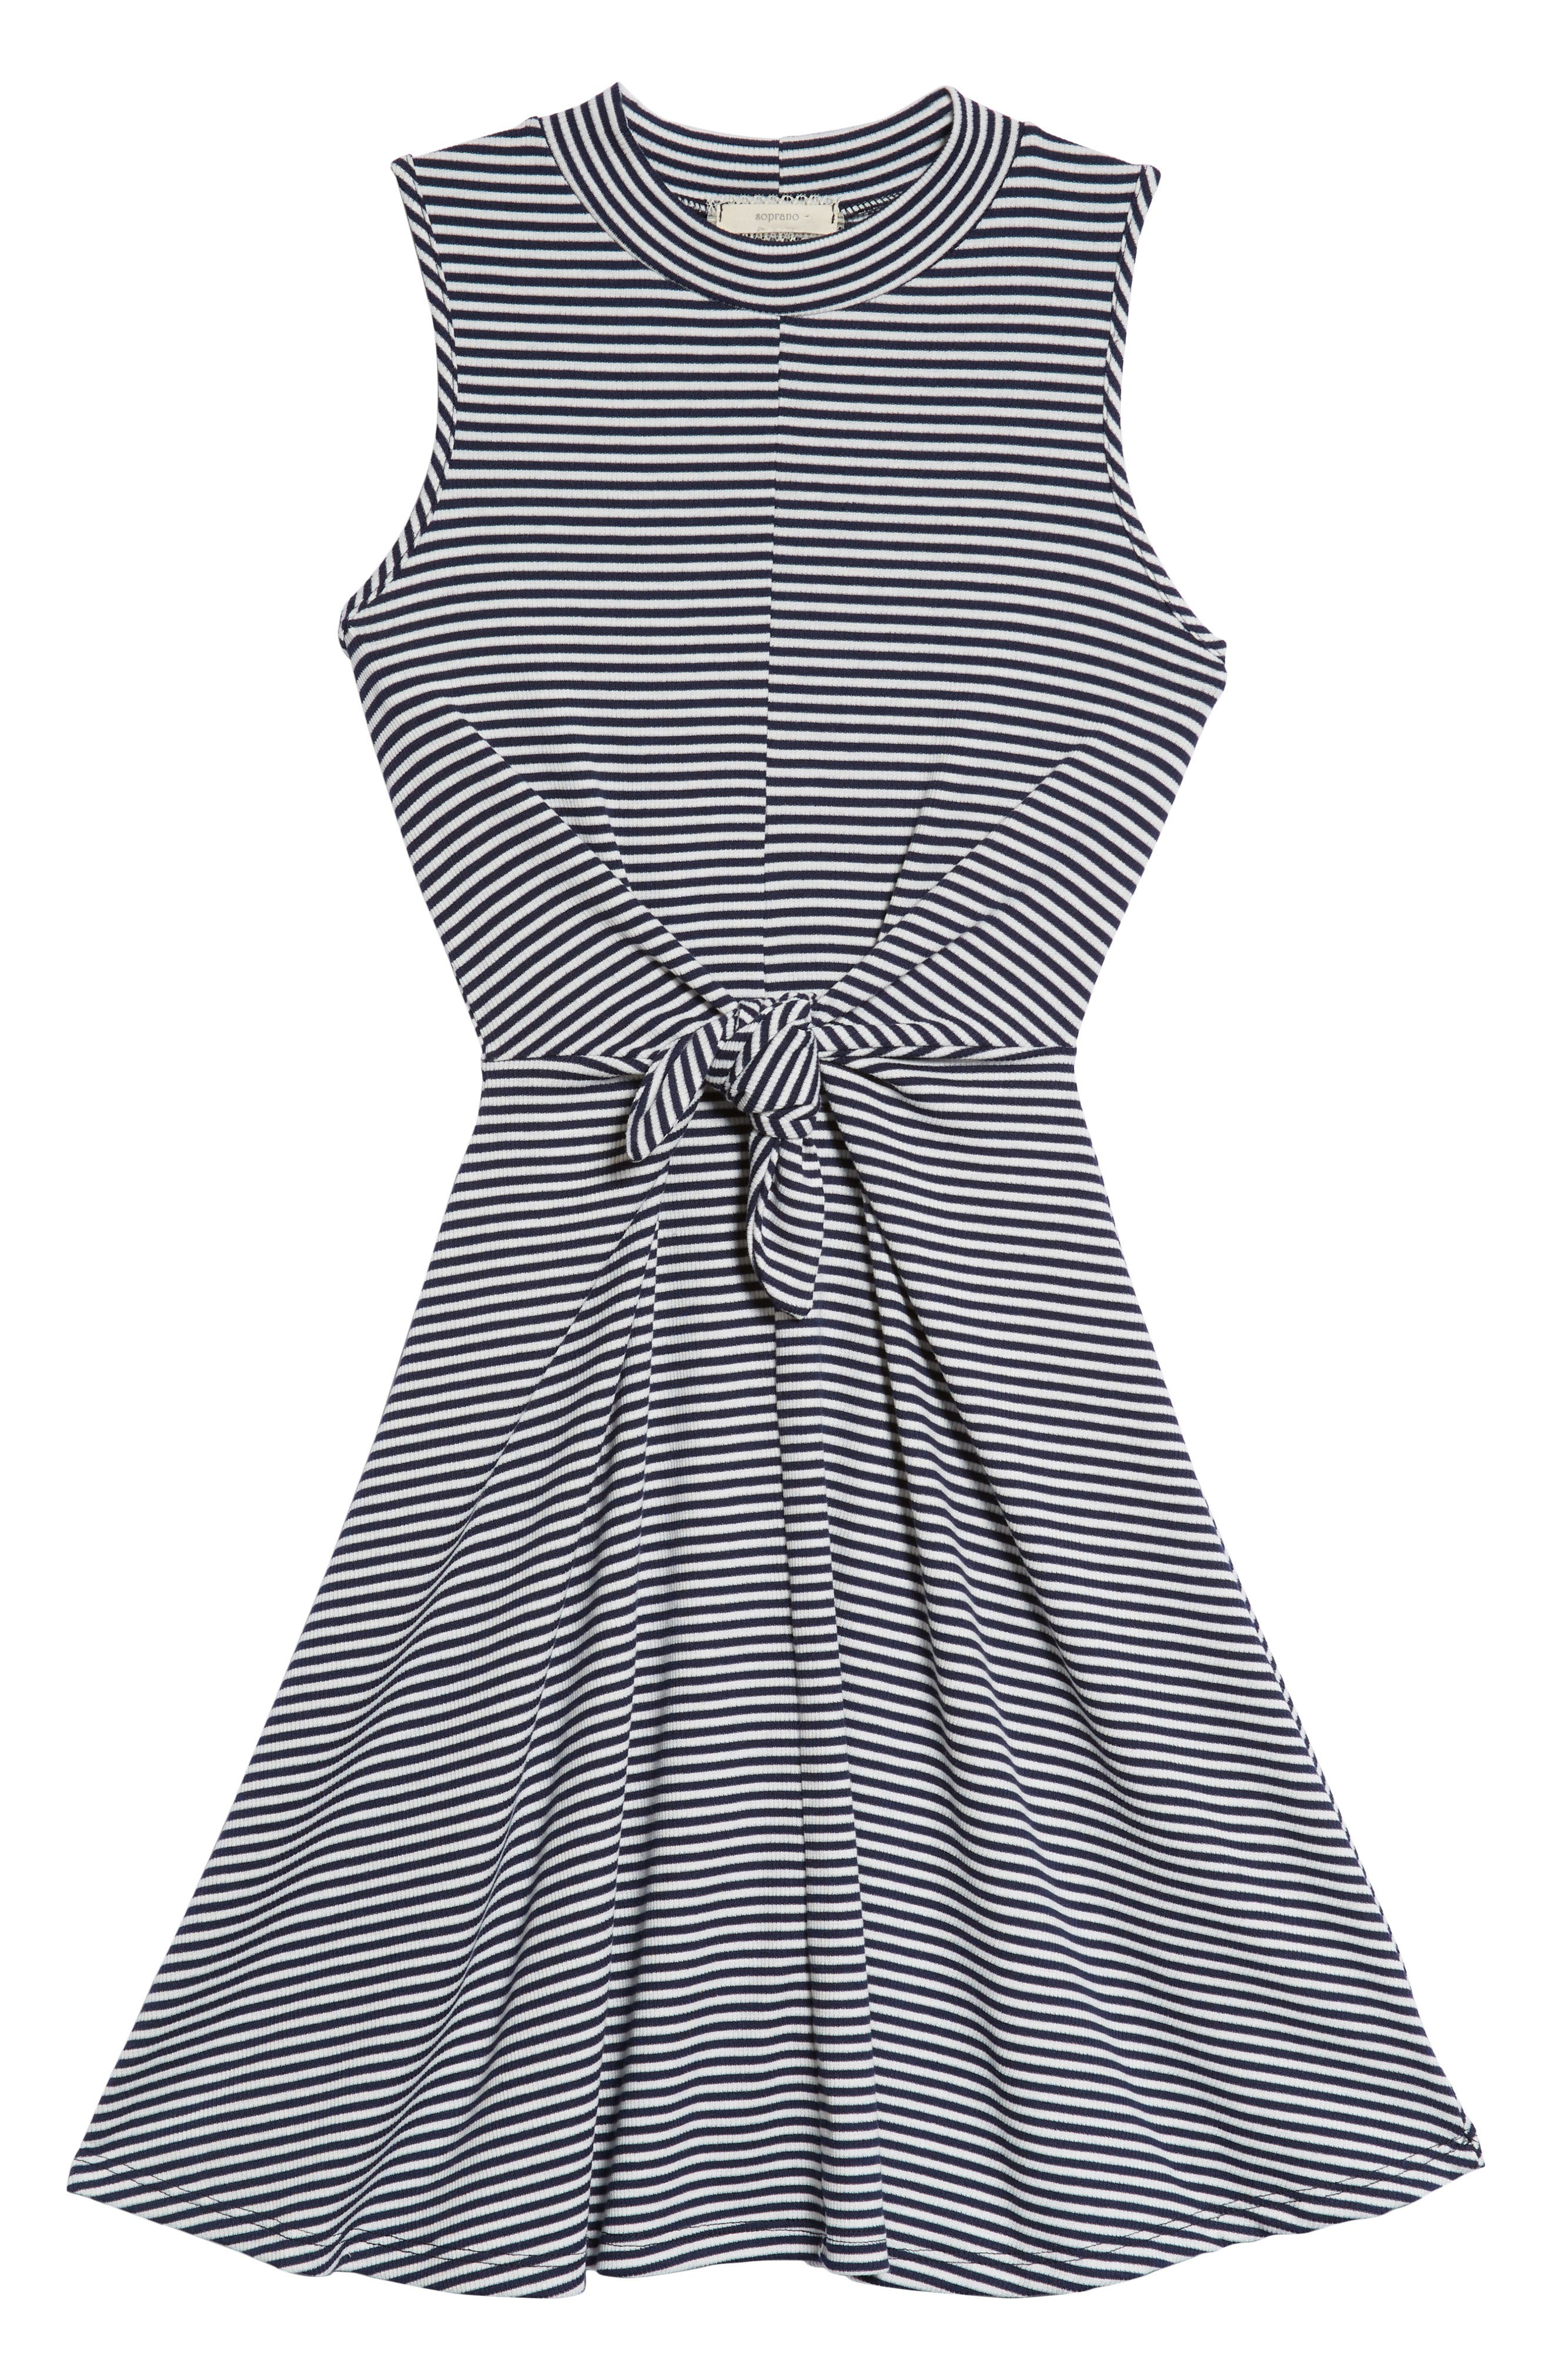 Tie Front Skater Dress,                         Main,                         color, 410